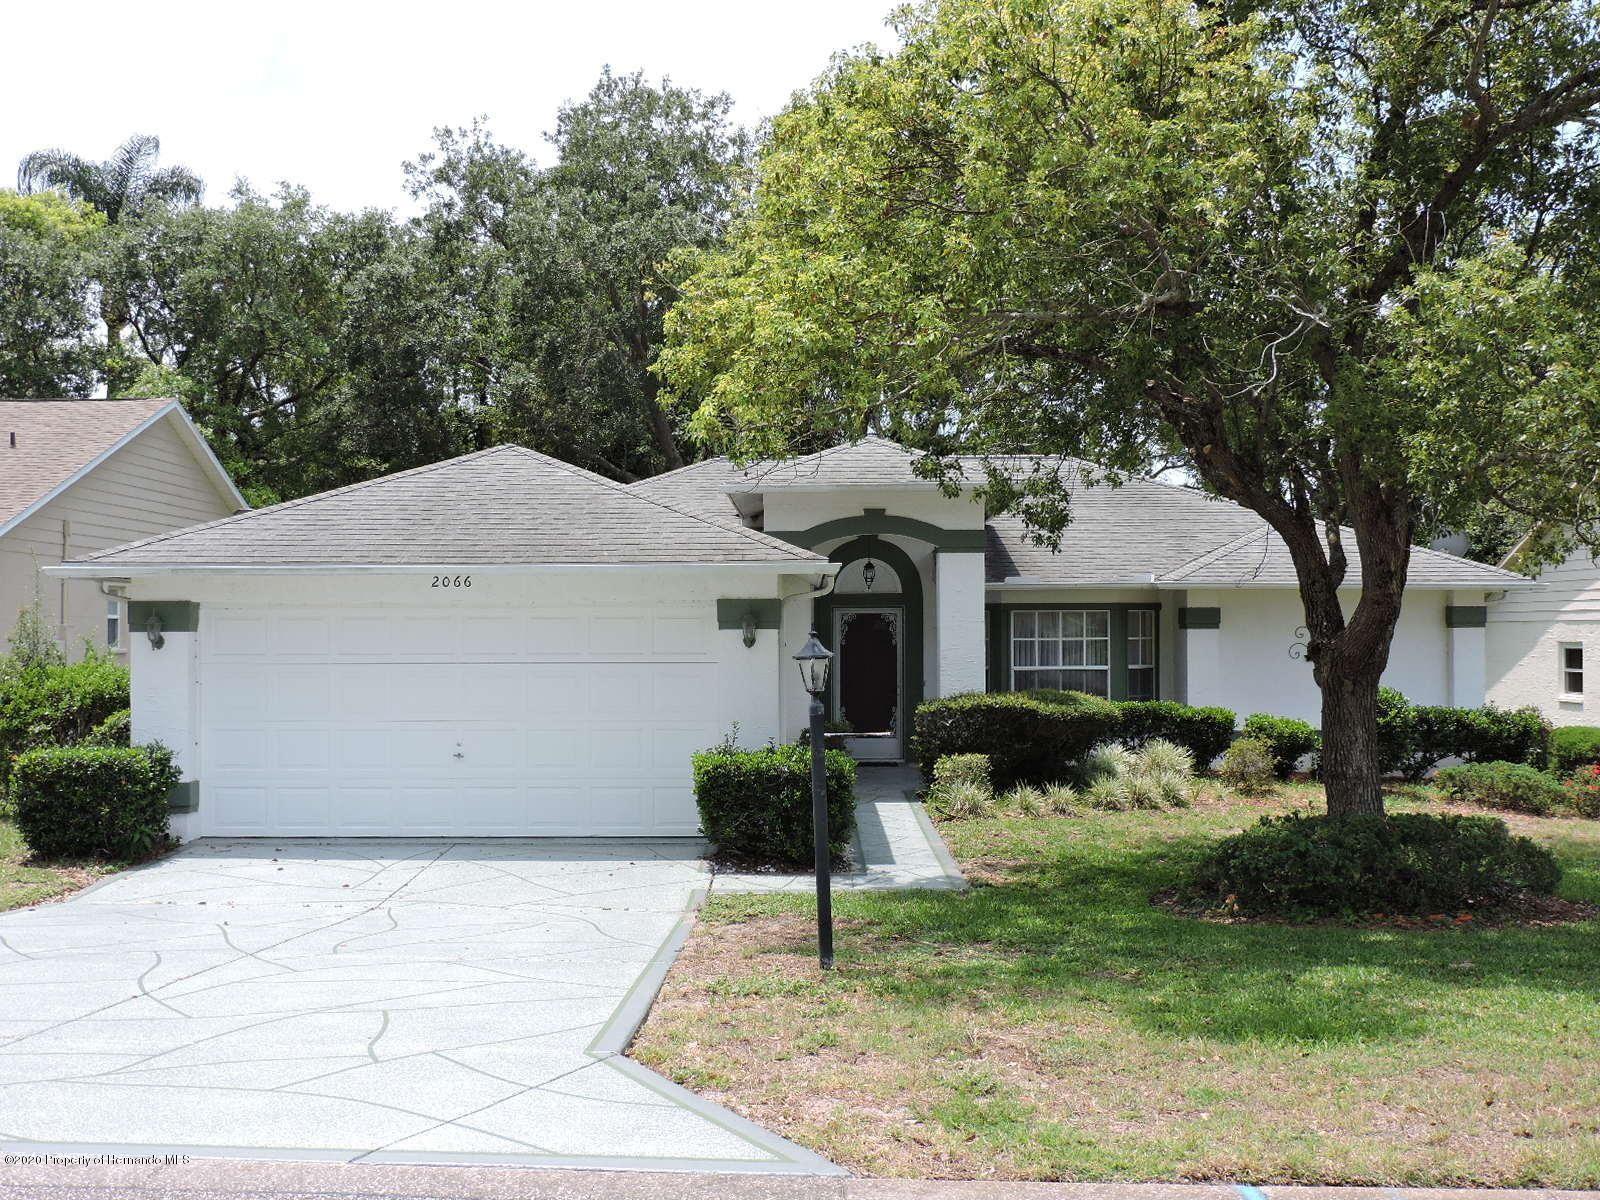 2066 Terrace View Lane, Spring Hill, FL 34606 - MLS#: 2209526